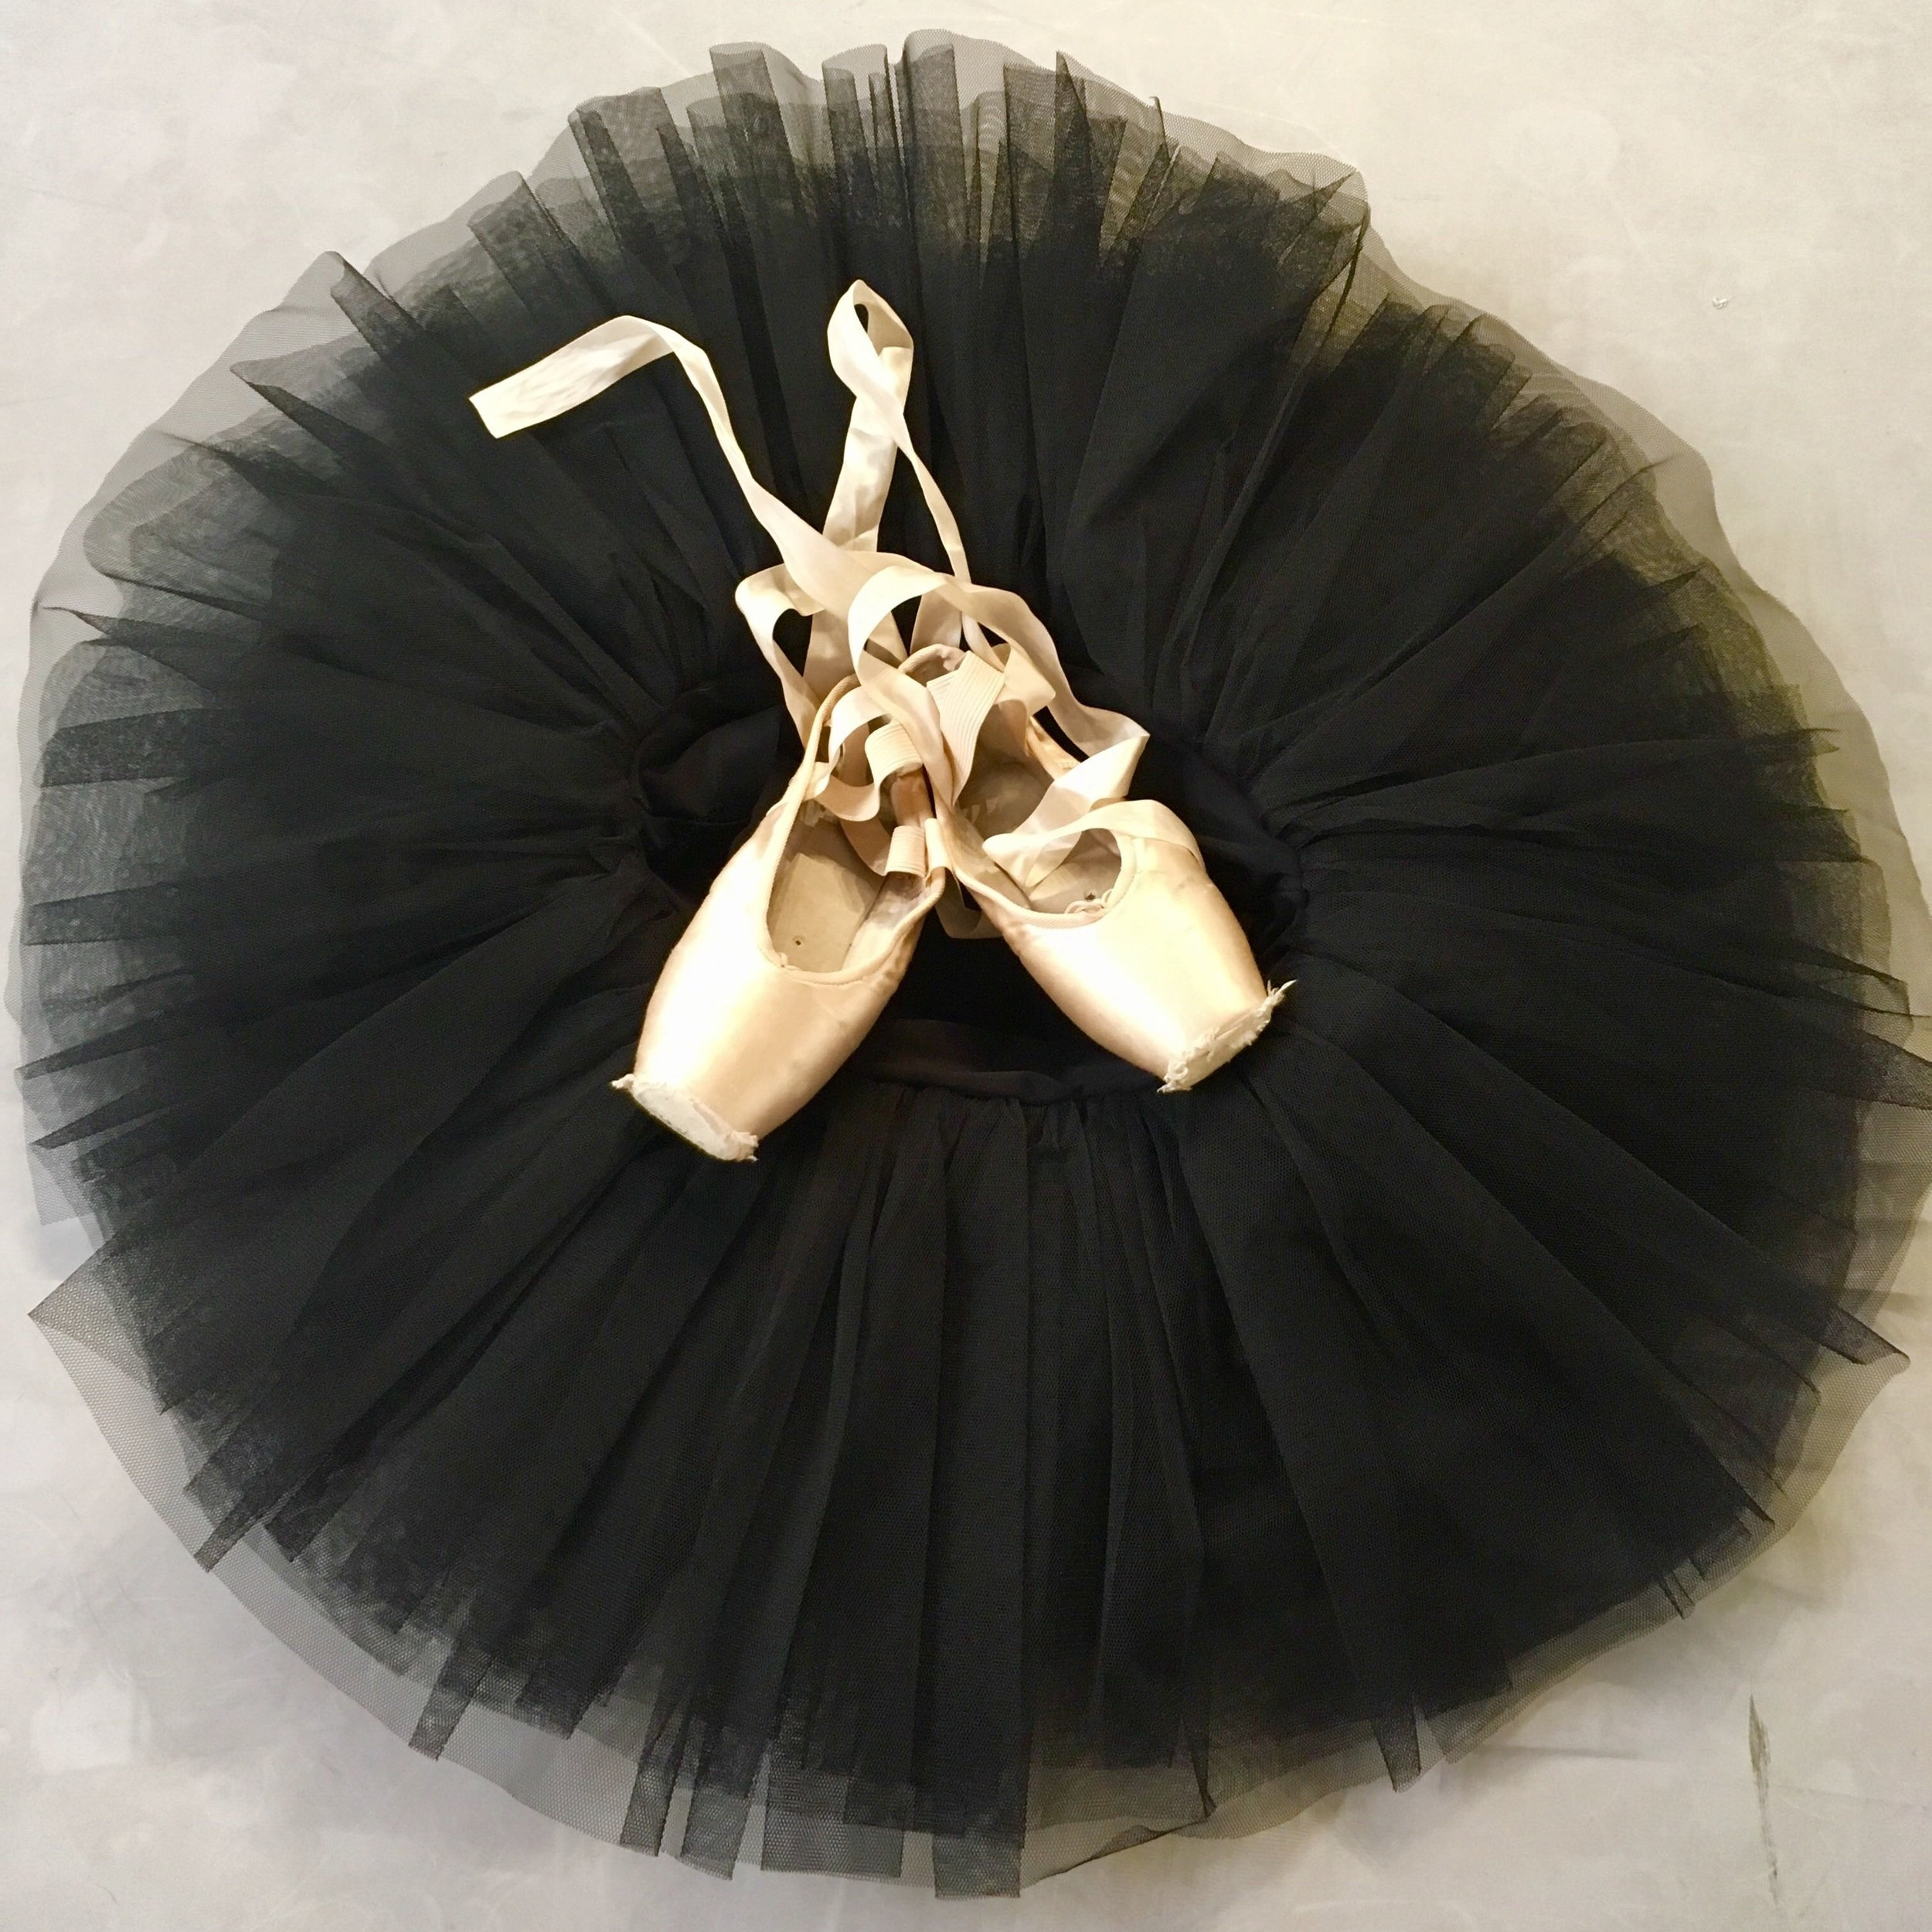 Photo courtesy of Broche Ballet instructor, Casey Pottle